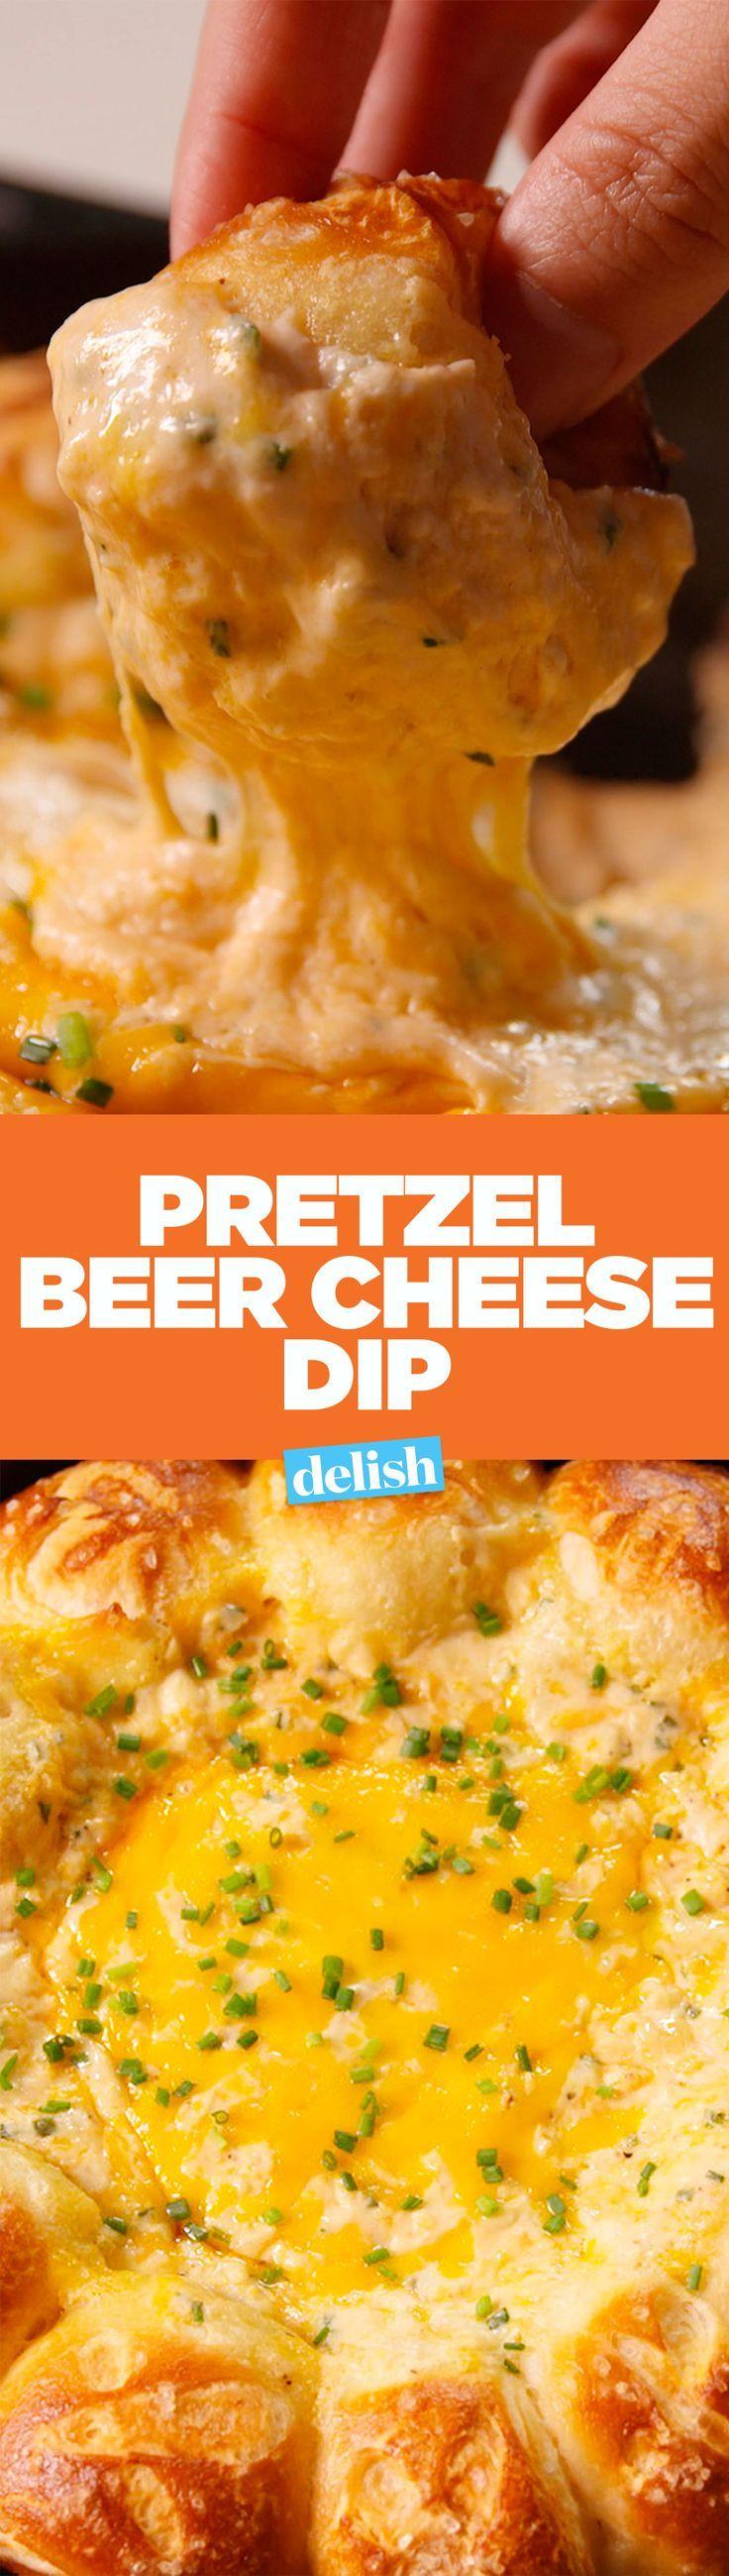 Pretzel Beer Cheese Dip Is Proof You Can Pretzel At Home  - http://Delish.com